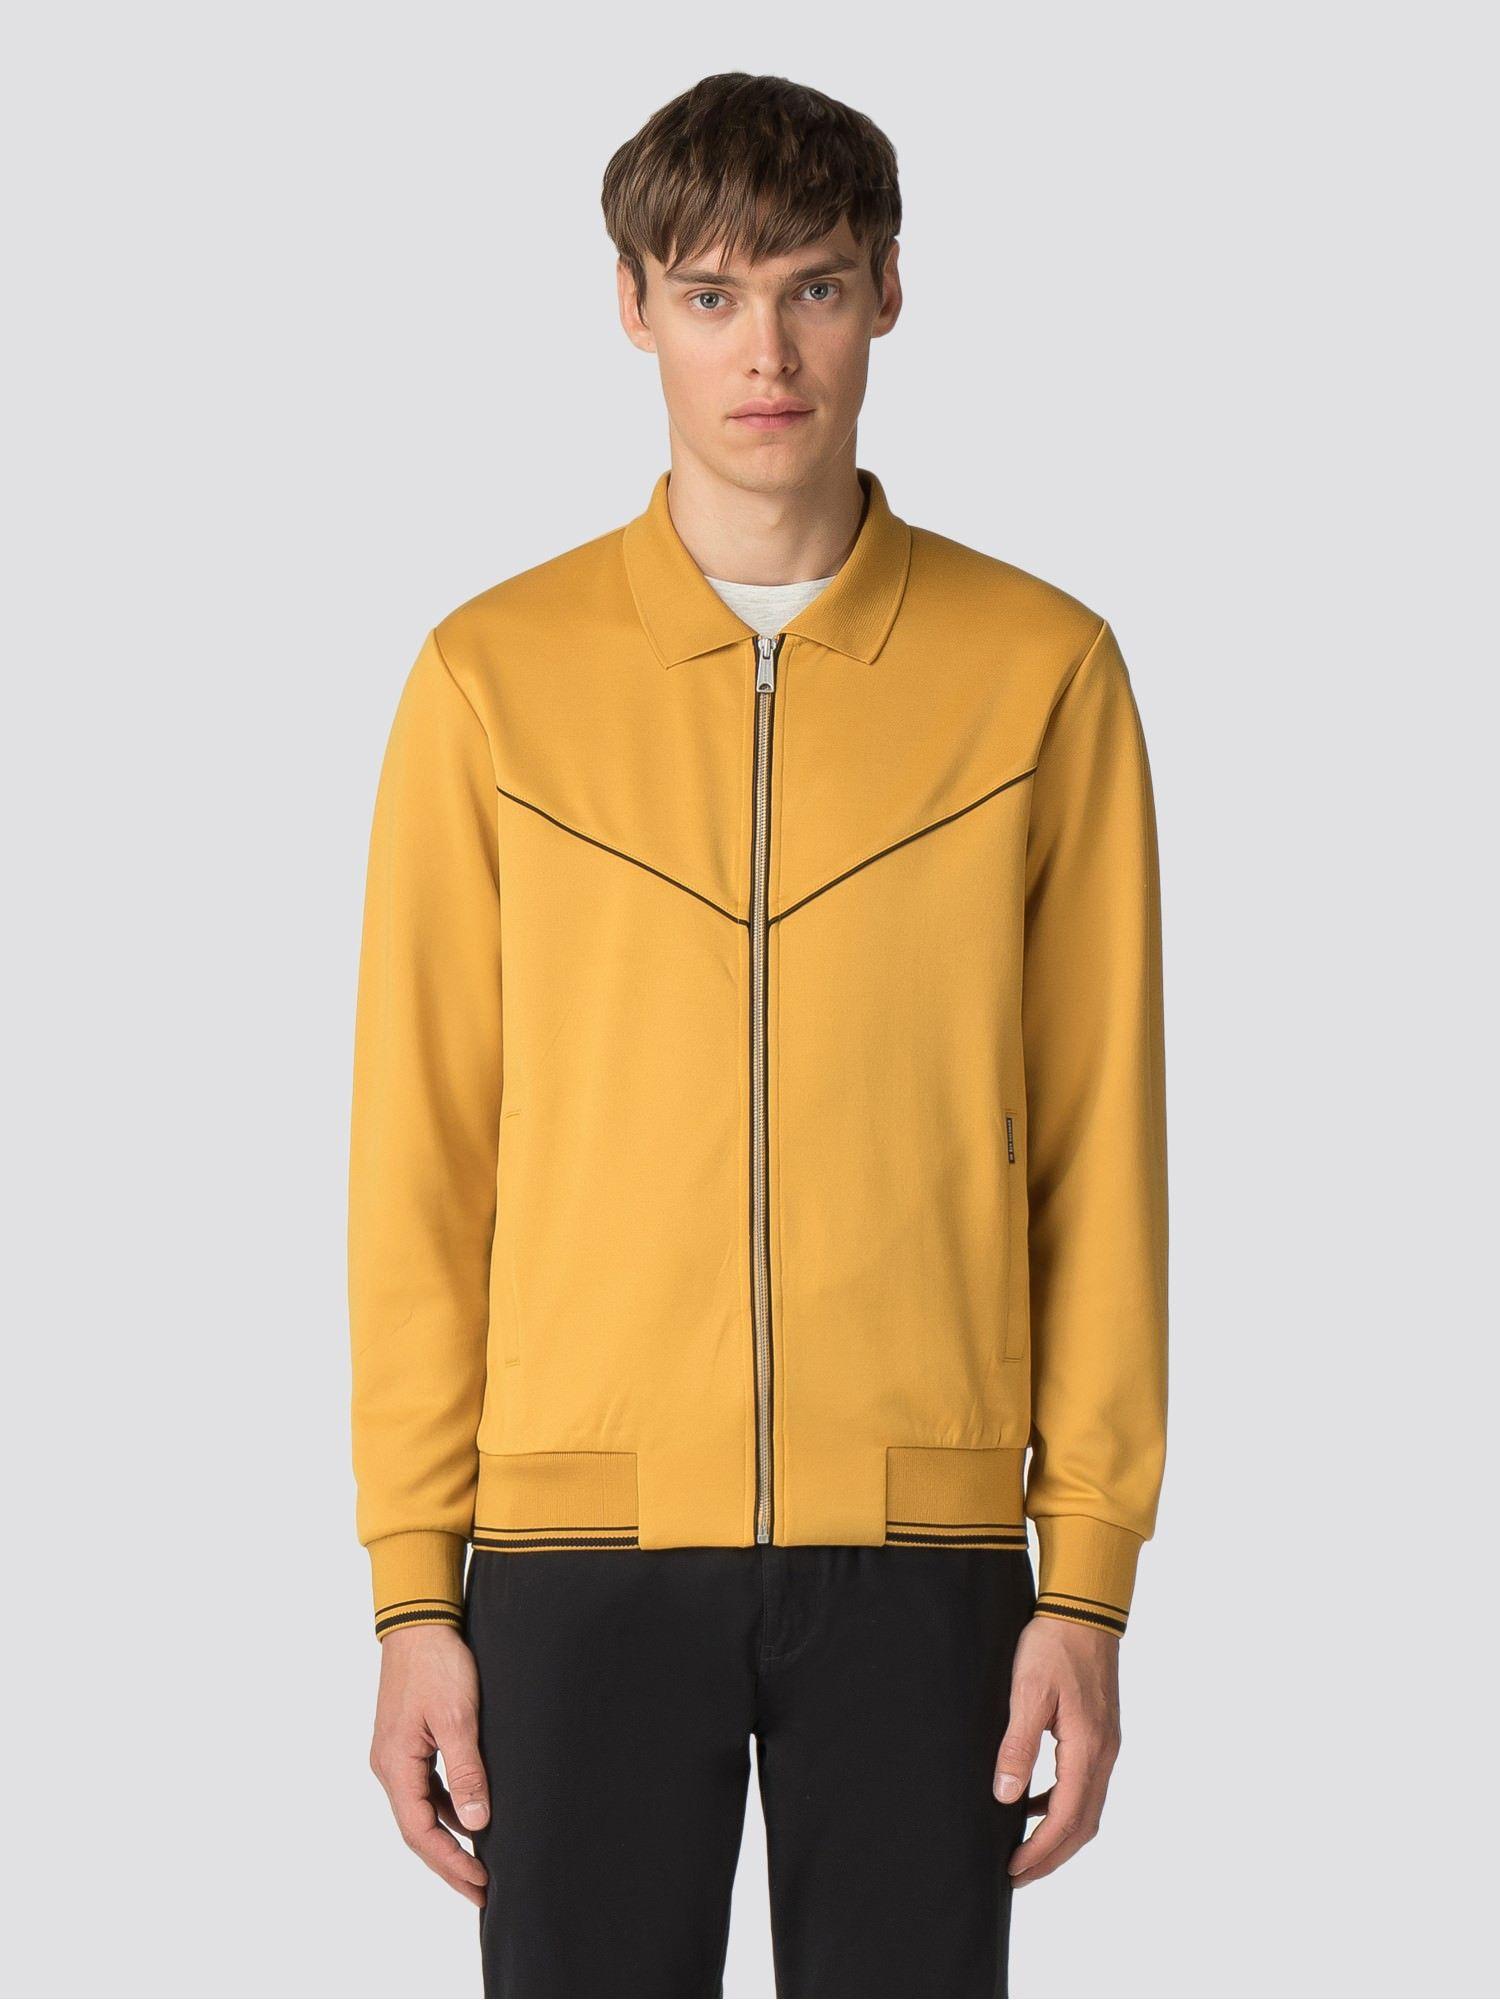 undefined in 2019 Sports jacket, Jackets, Designer